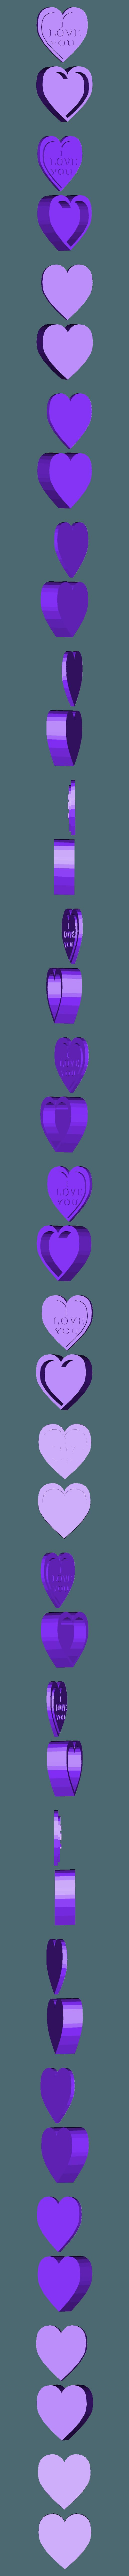 "Boite Coeur.stl Download free STL file I LOVE YOU"" Heart Box • 3D print object, Painzone"